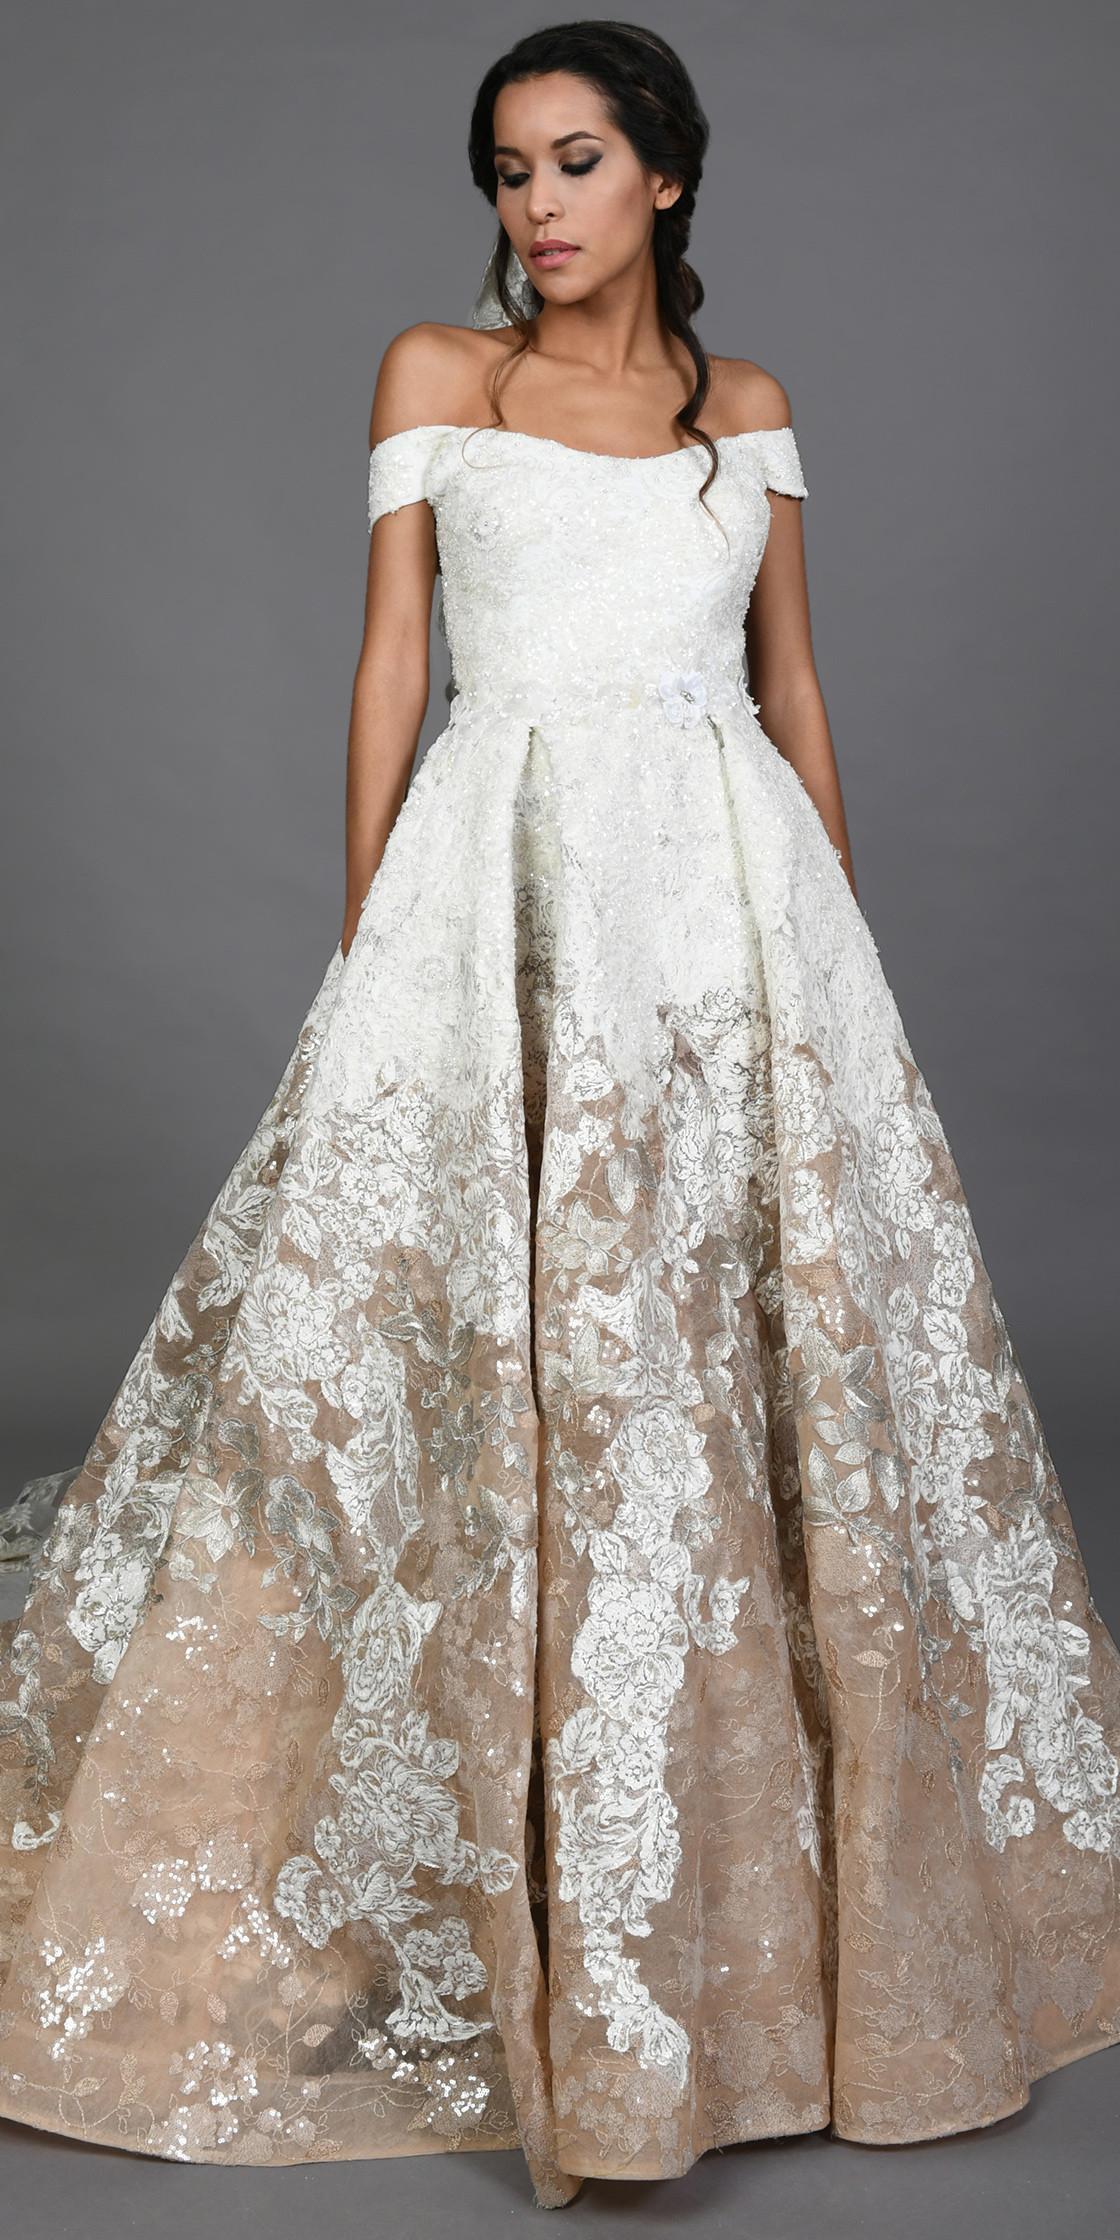 Bridal Dresses For Rent Ficts